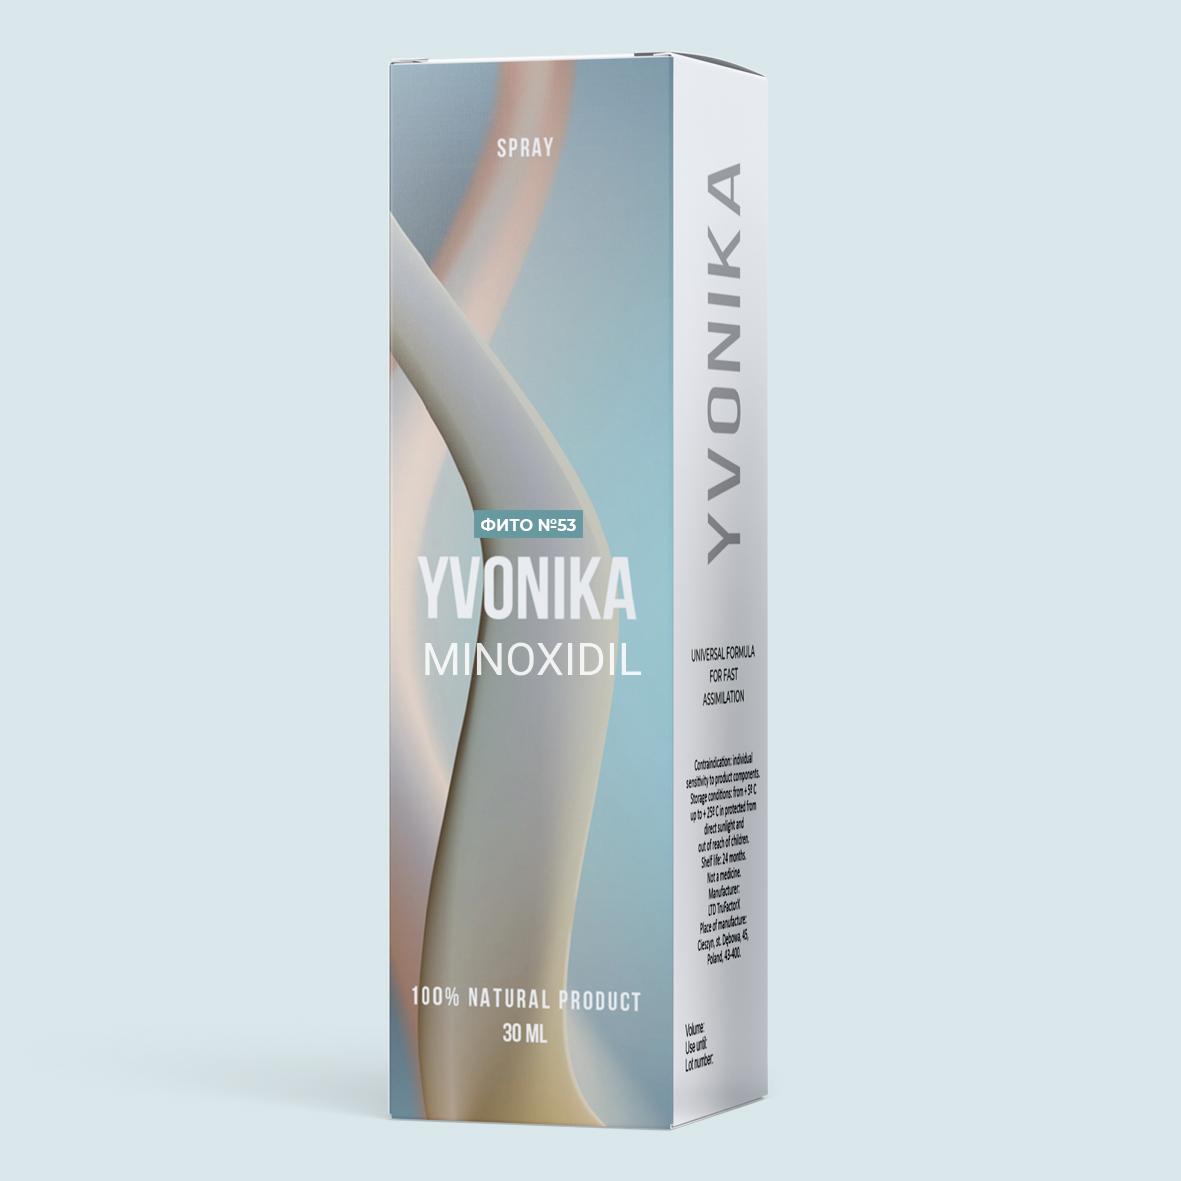 MINOXIDIL (Миноксидил) - средство для роста волос